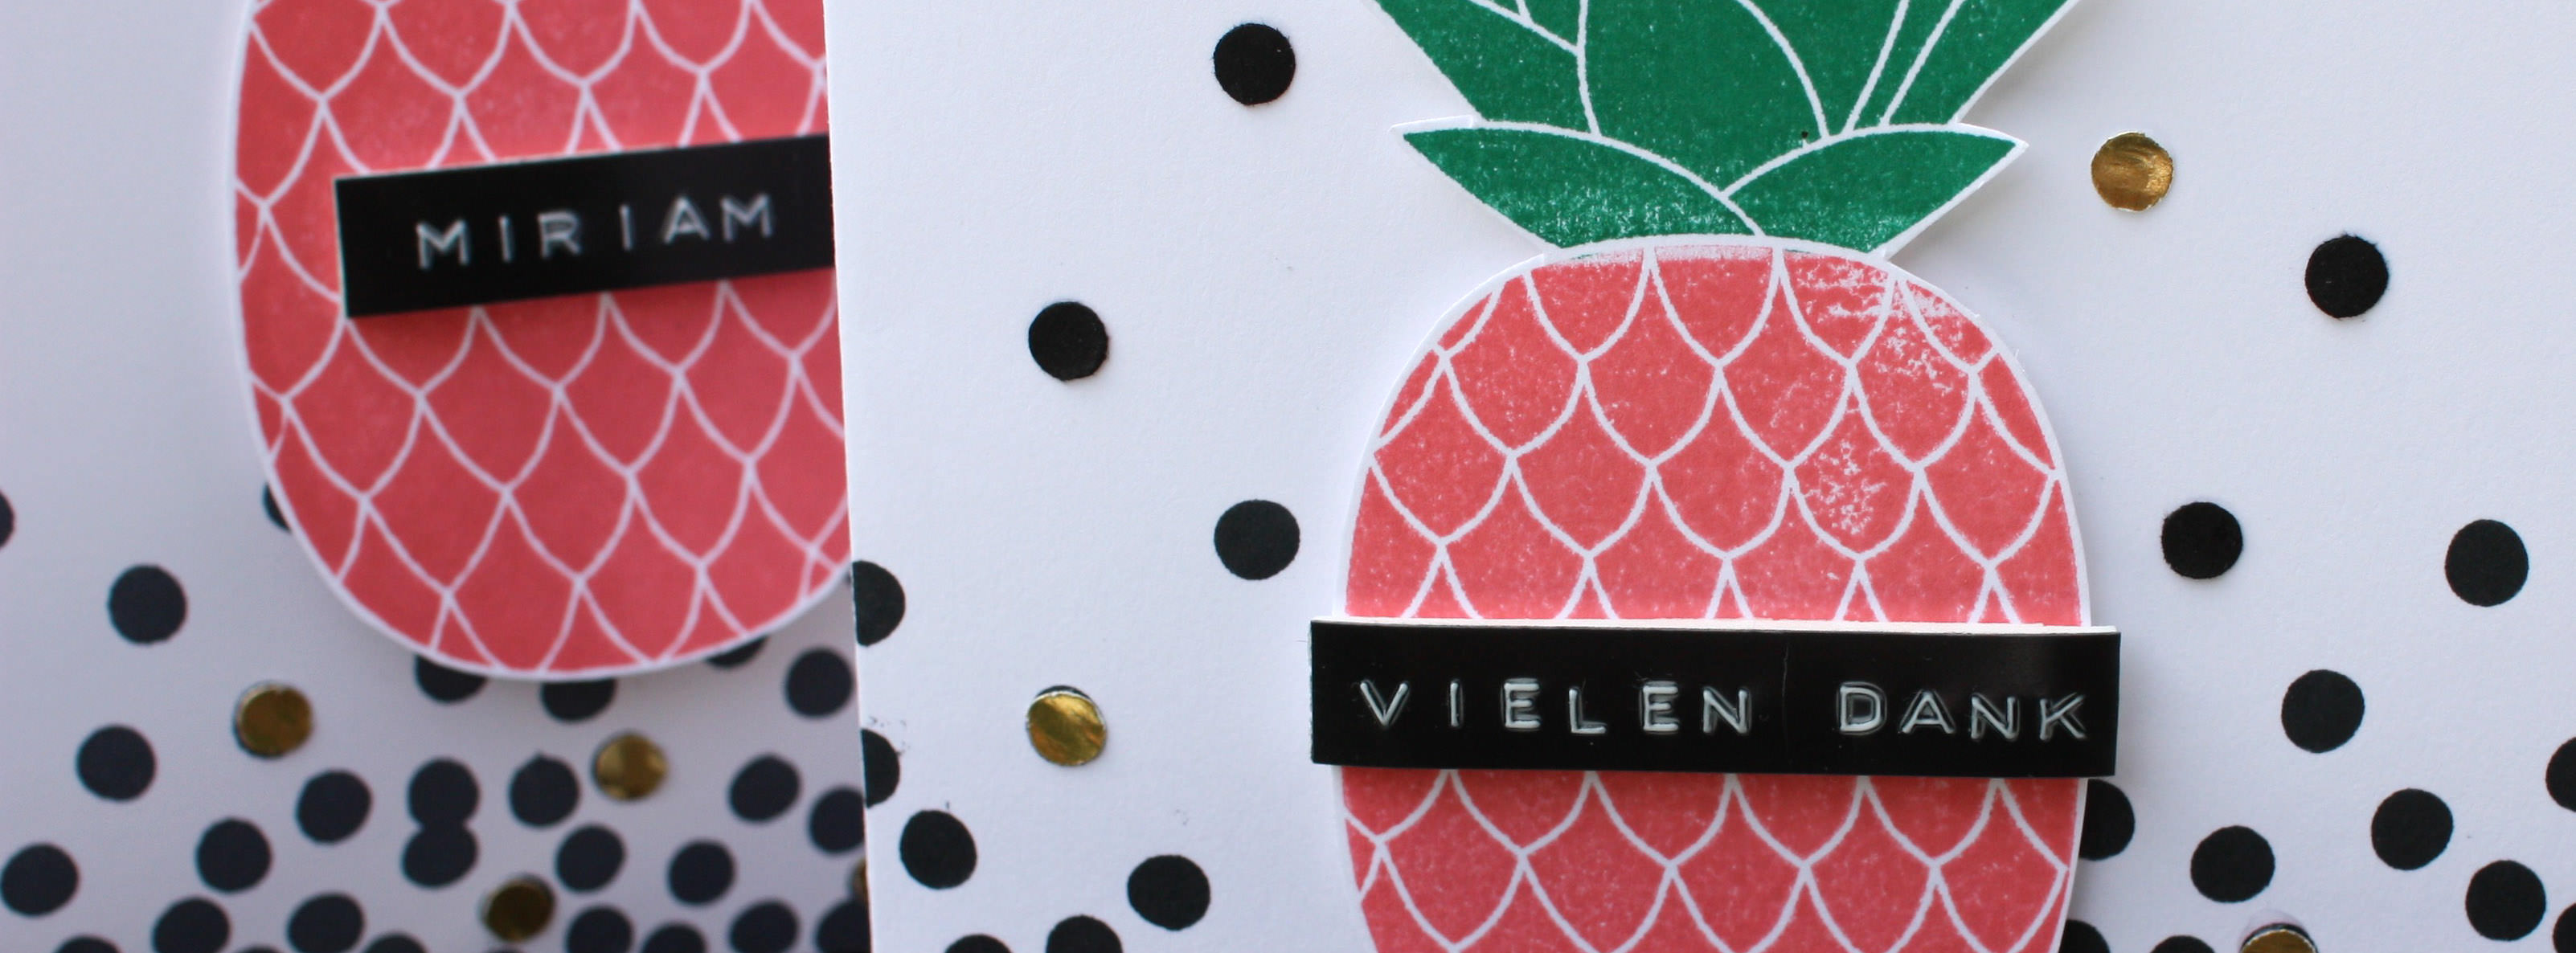 Stampin Up - Stempelherz - Inspiration-Art-Lieblingsstempelset - Stempelset Pineapple - Vielen Dank ans Team Beitragsbild 01